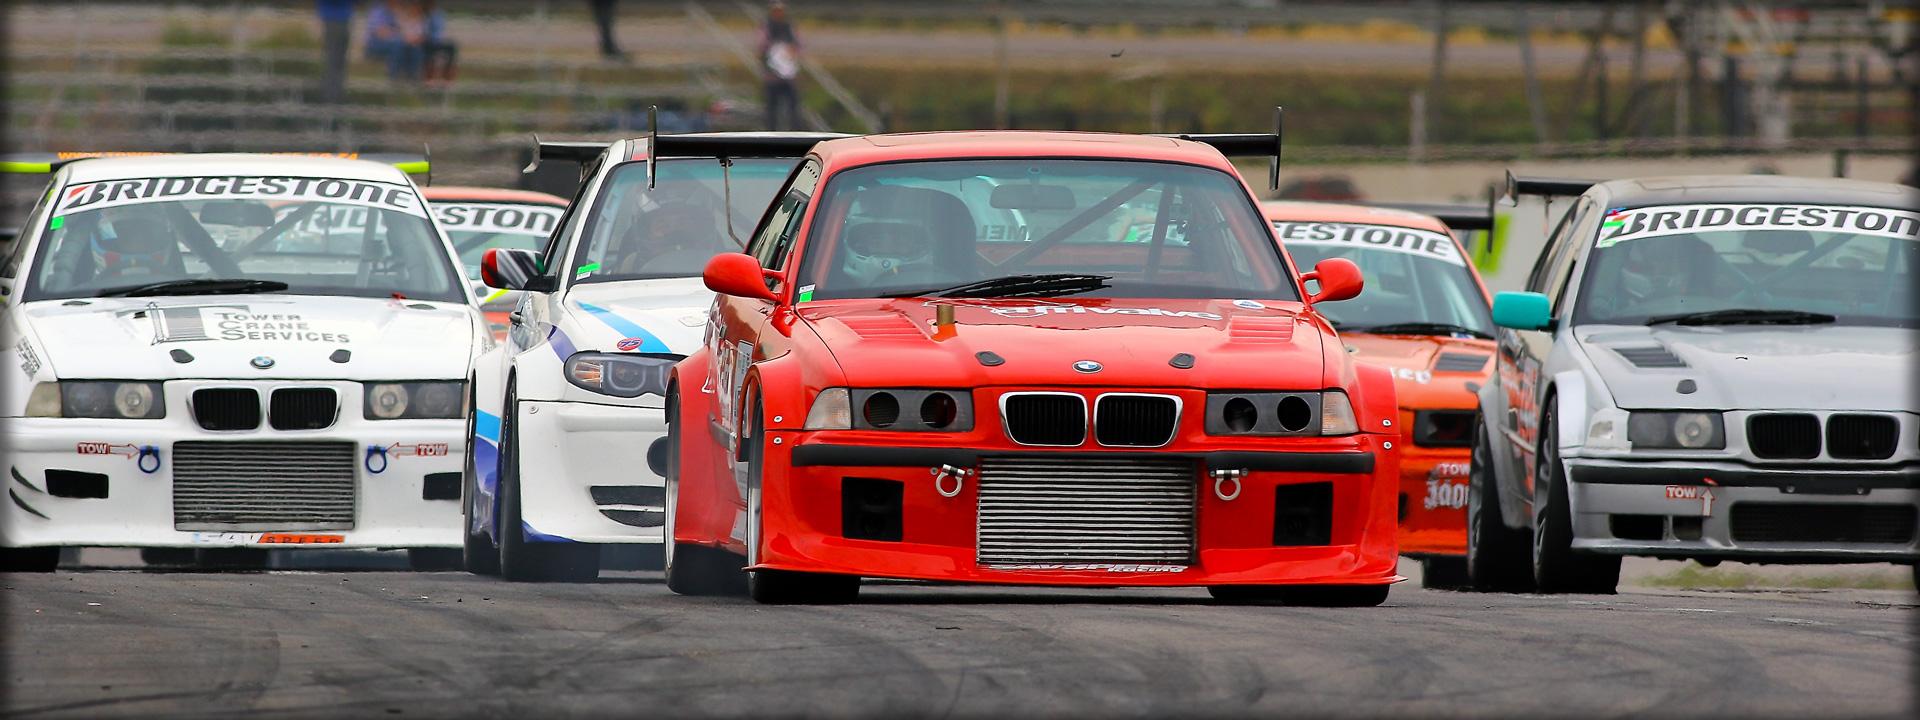 Inland Championship - Round 7 - Zwartkops Raceway - 17 September 2016 - Race Report